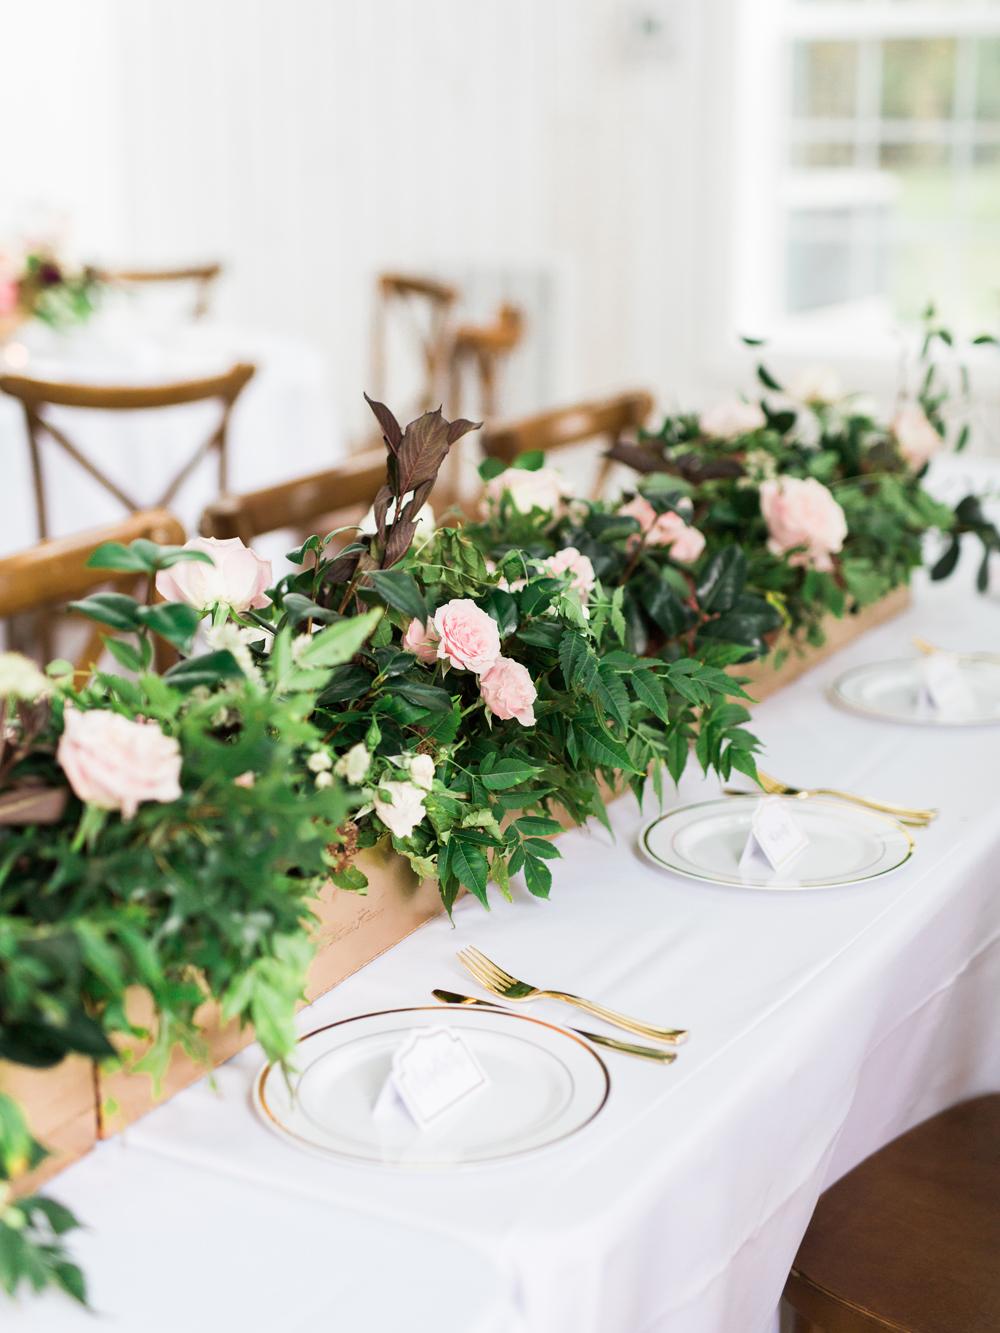 wedding tablescapes - photo by Elisabeth Carol Photography http://ruffledblog.com/picturesque-garden-wedding-at-white-sparrow-barn